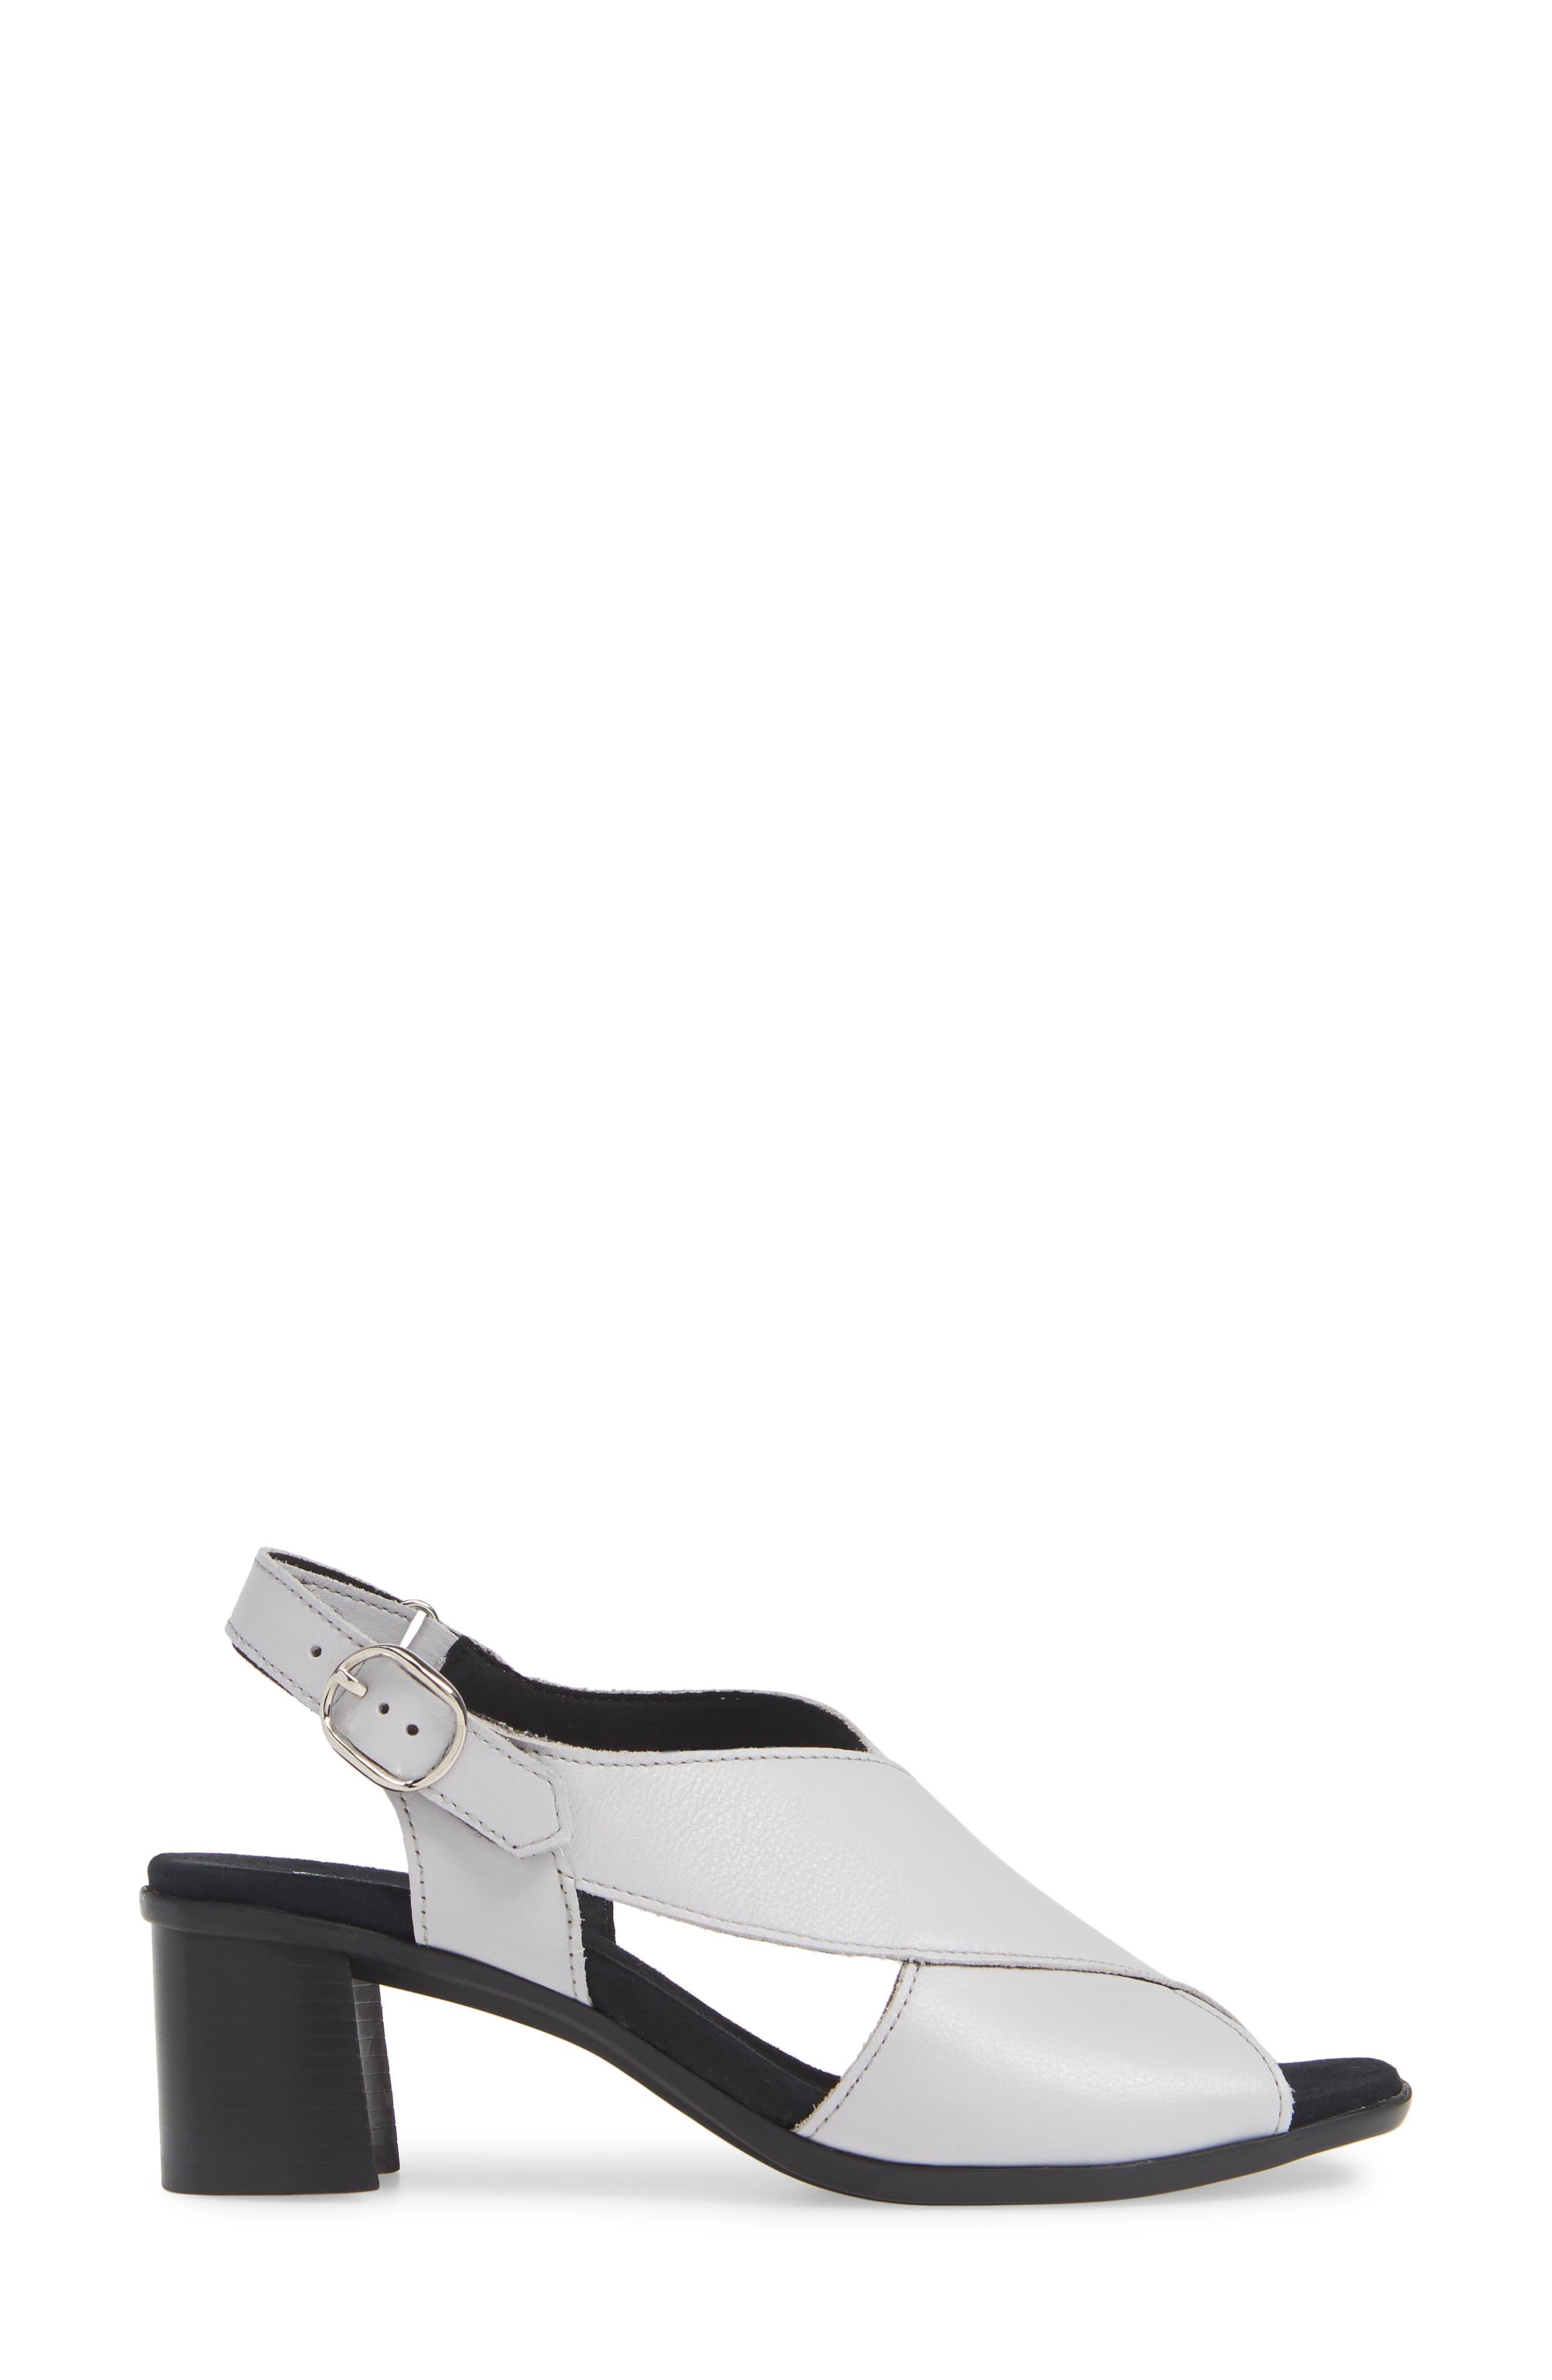 Laine Block Heel Sandal,                             Alternate thumbnail 3, color,                             WHITE LEATHER